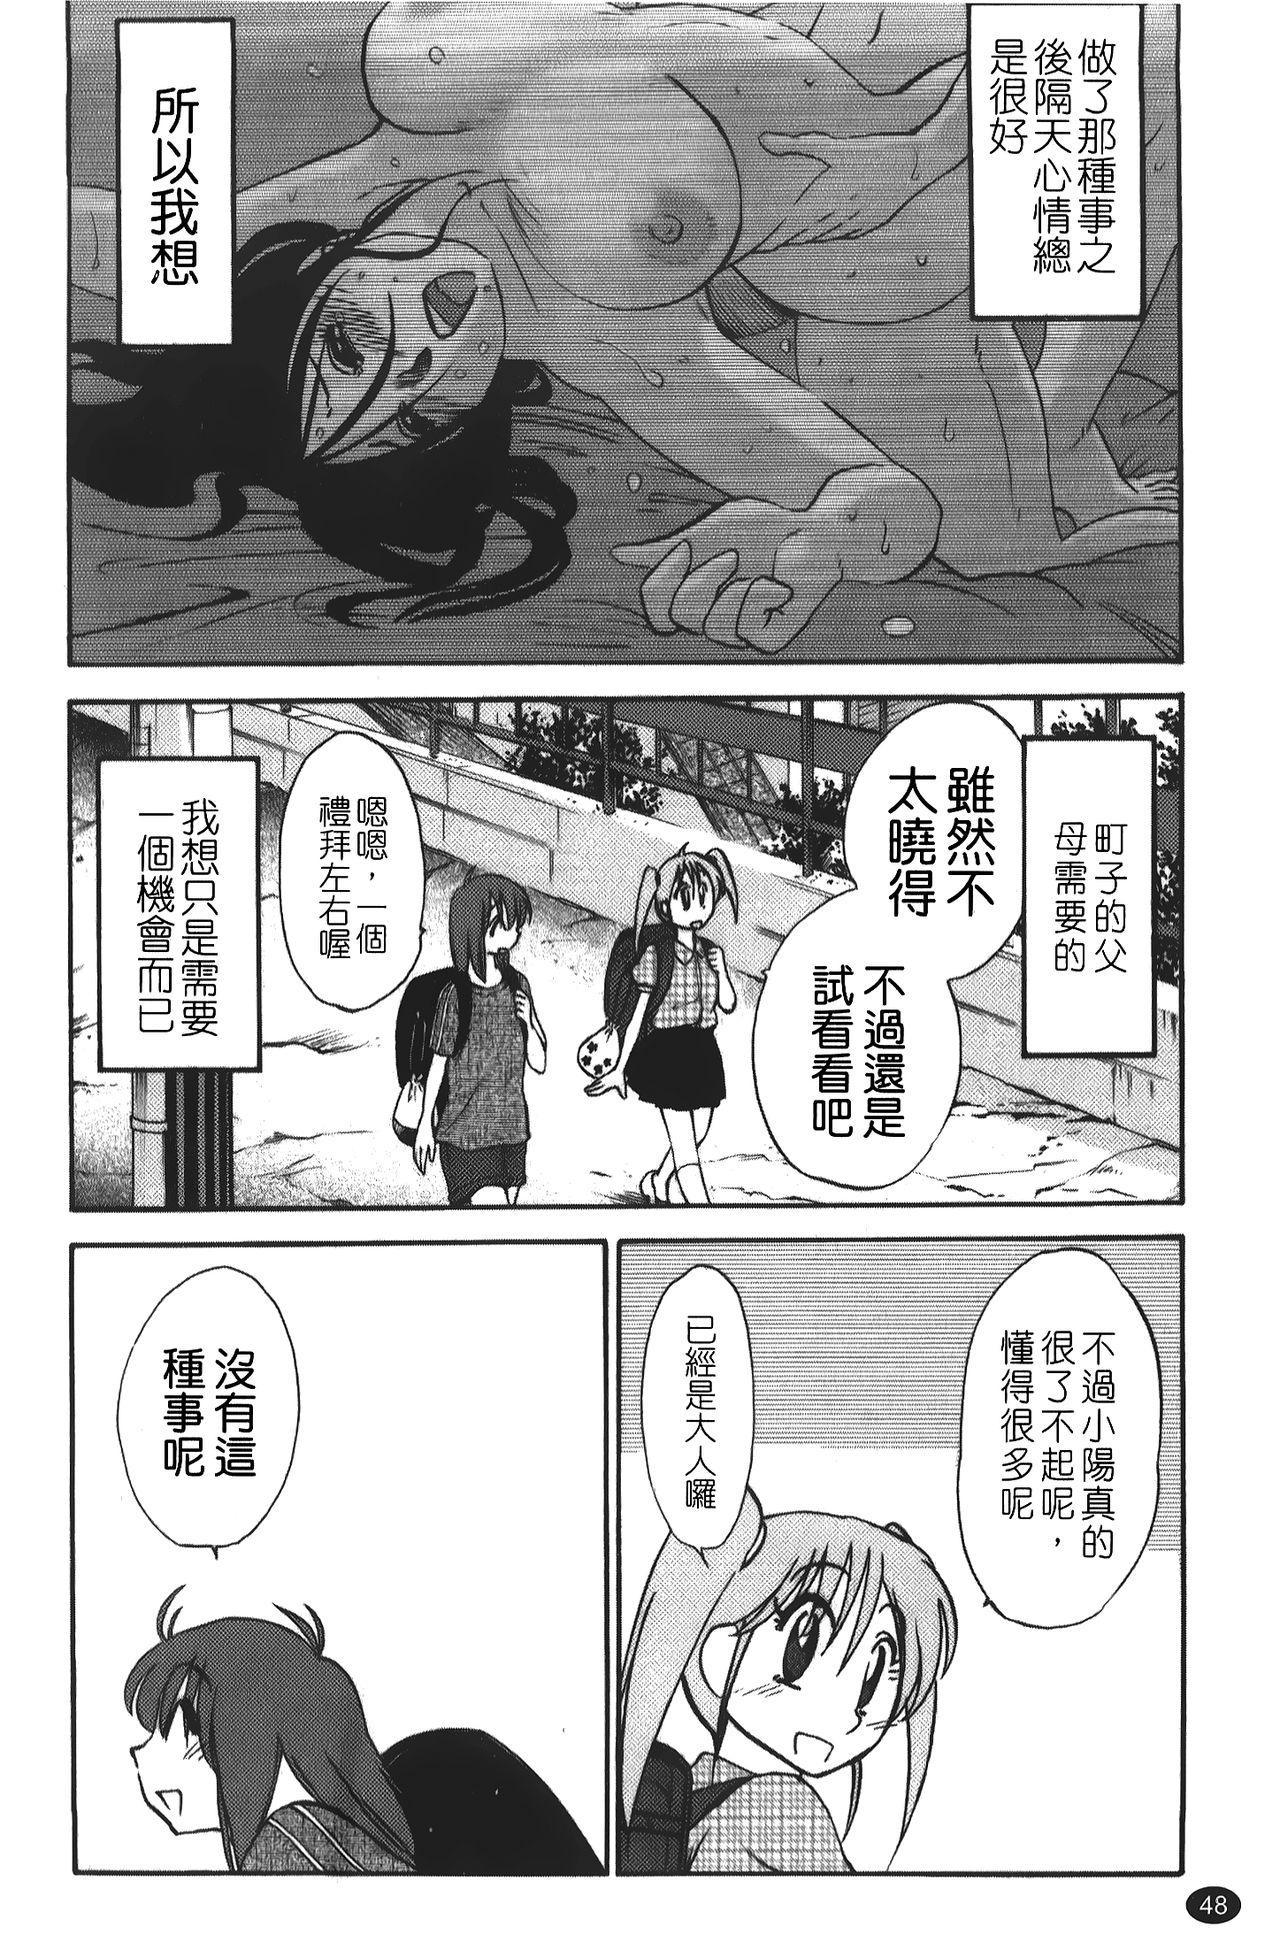 hirugao   白日之顏 48